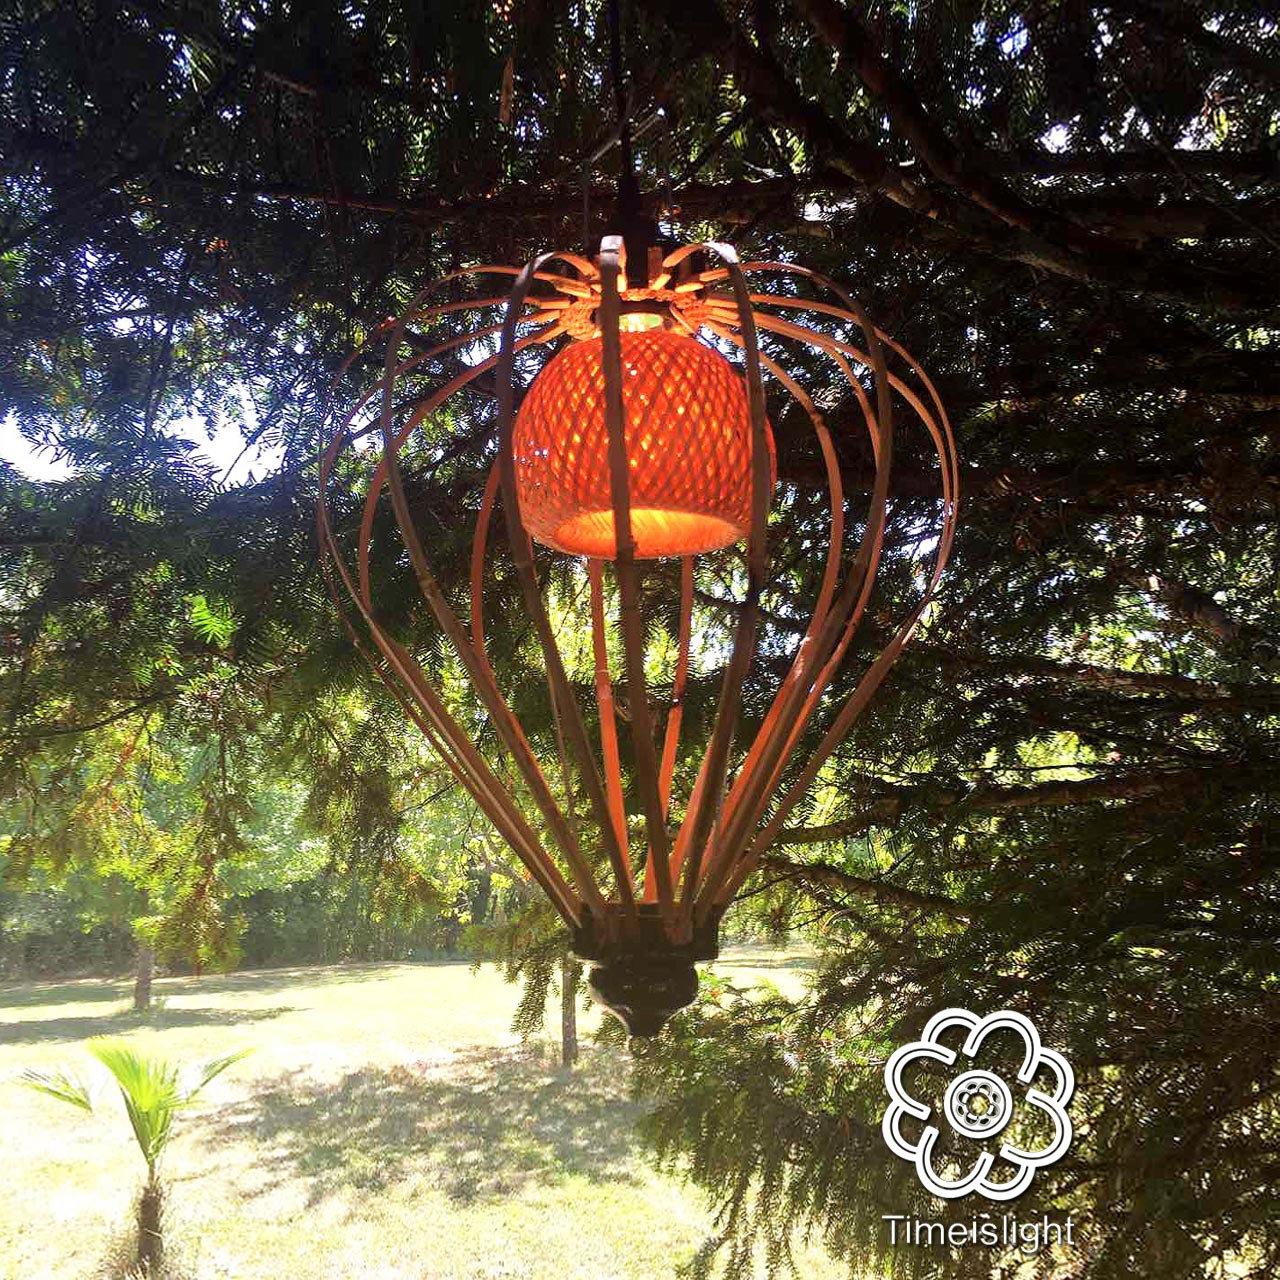 Suspension PHYSALIS place 30 cm x H 45 cm \u00d8 Timeislight bamboo